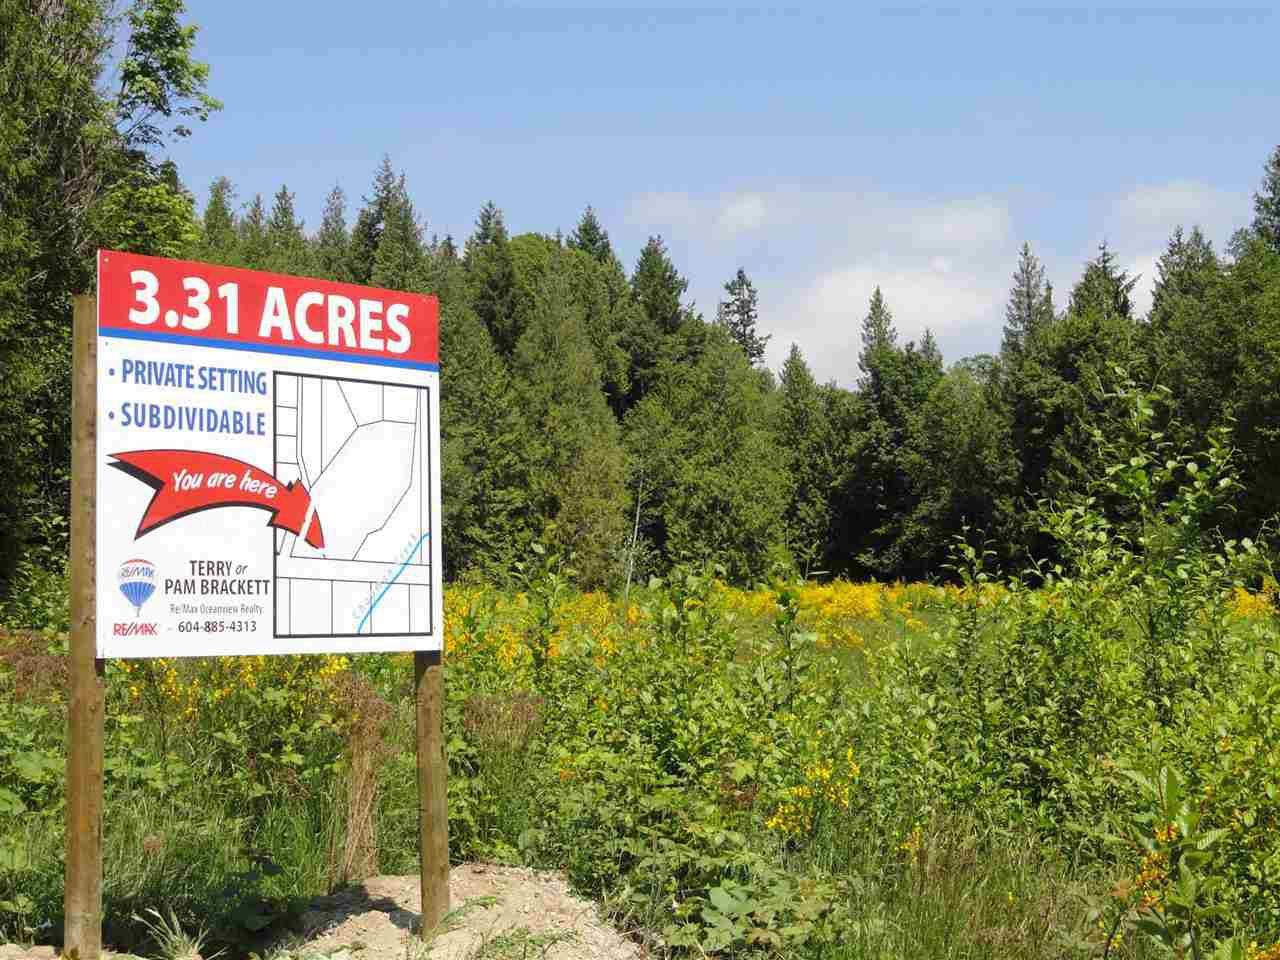 Photo 4: Photos: LOT 16 GUNCLUB ROAD in Sechelt: Sechelt District Home for sale (Sunshine Coast)  : MLS®# R2075941